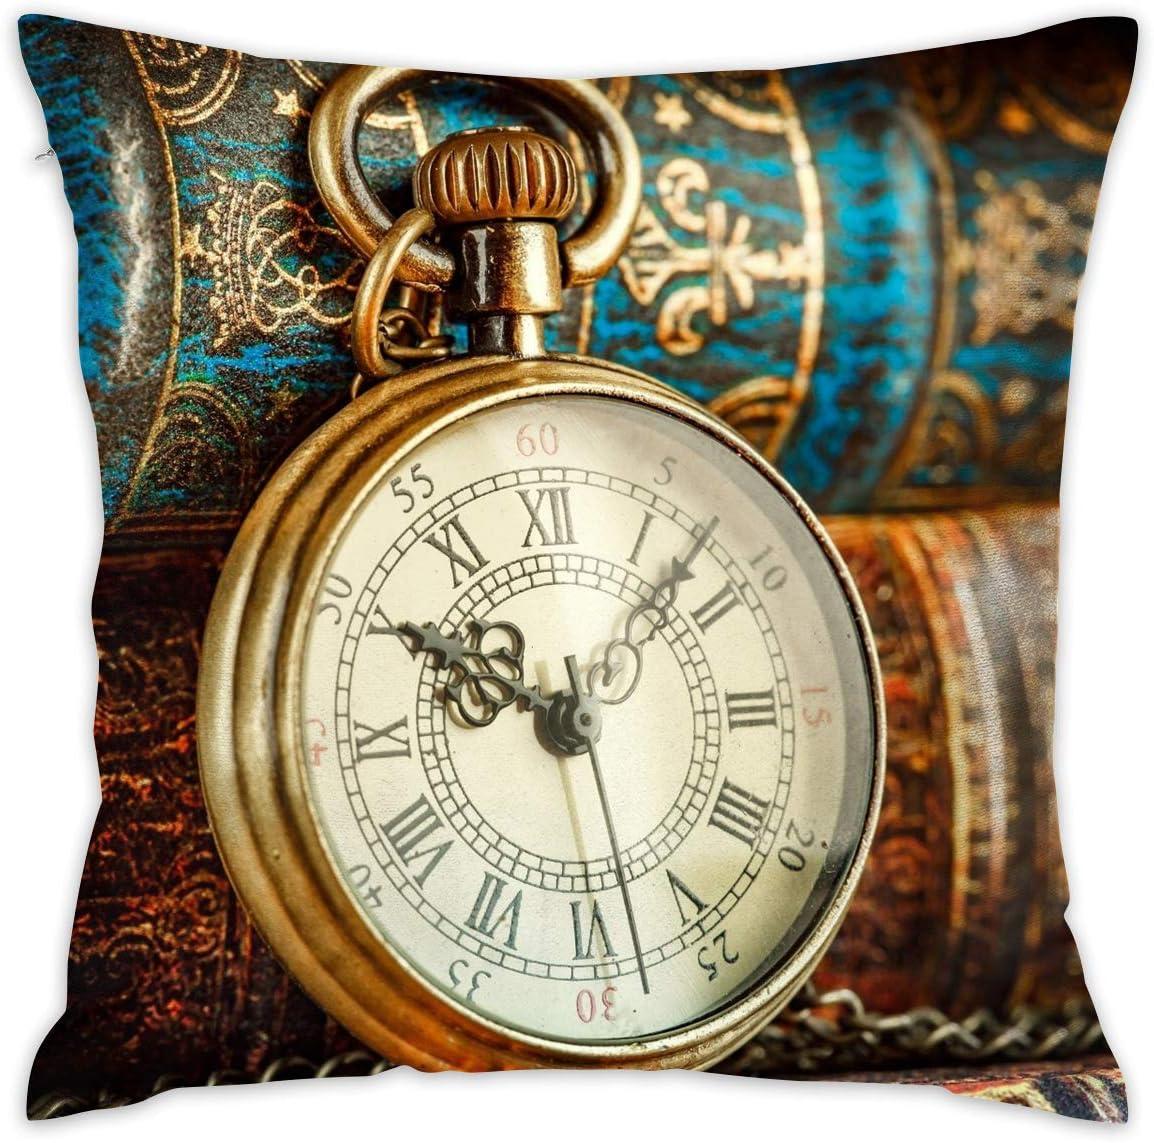 Amazon Com Karen Felix Throw Pillow Covers Old Wrist Watch Decorative Cushion Case For Sofa Bedroom Car 18 X 18 Inch 45 X 45 Cm Home Kitchen